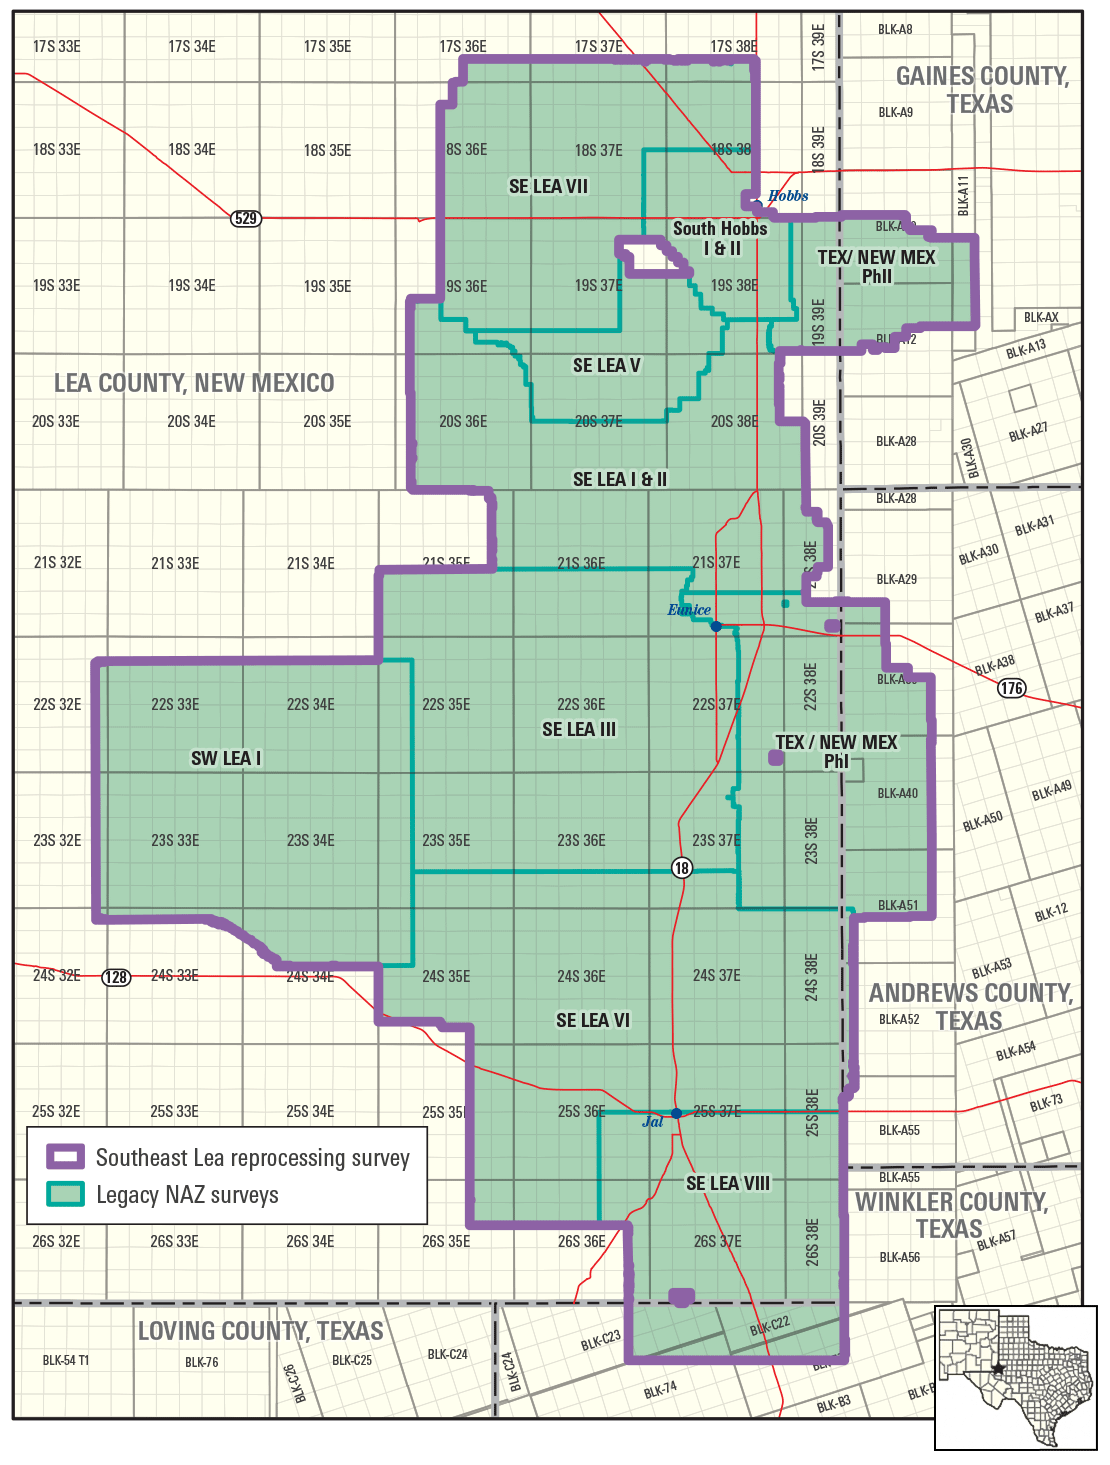 Blocks showing Southeast Lea Depth Reimaging and Survey Merge project